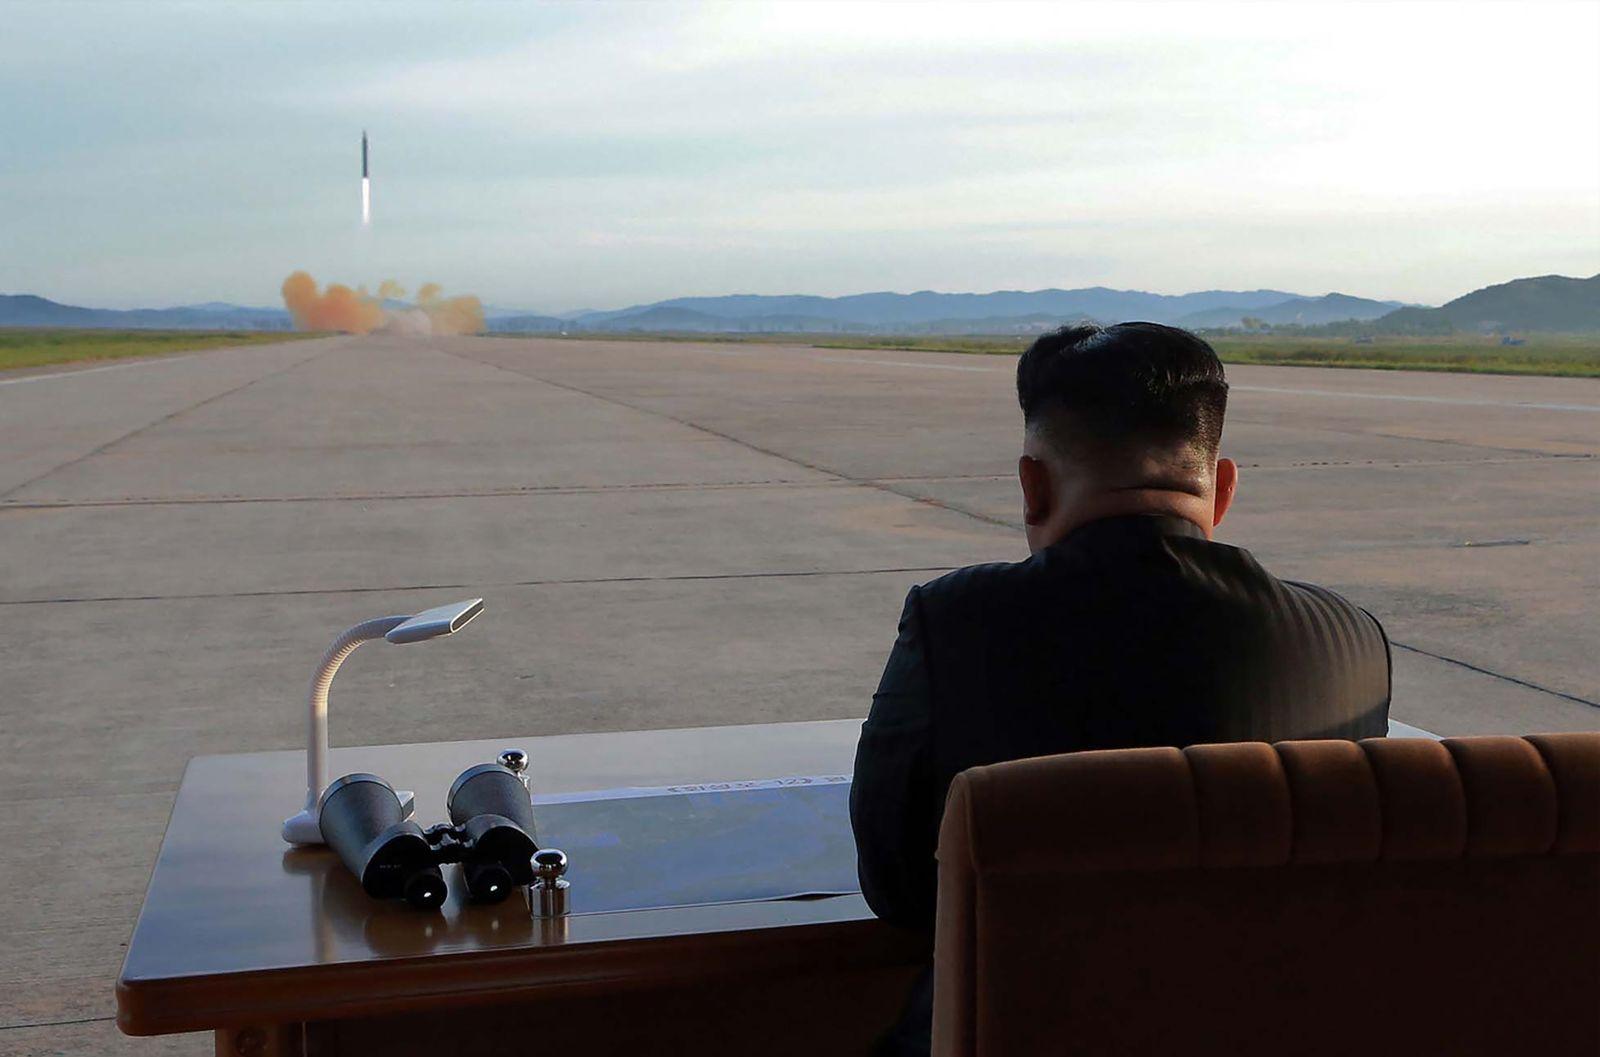 Kim Jong Un/ Raketentest